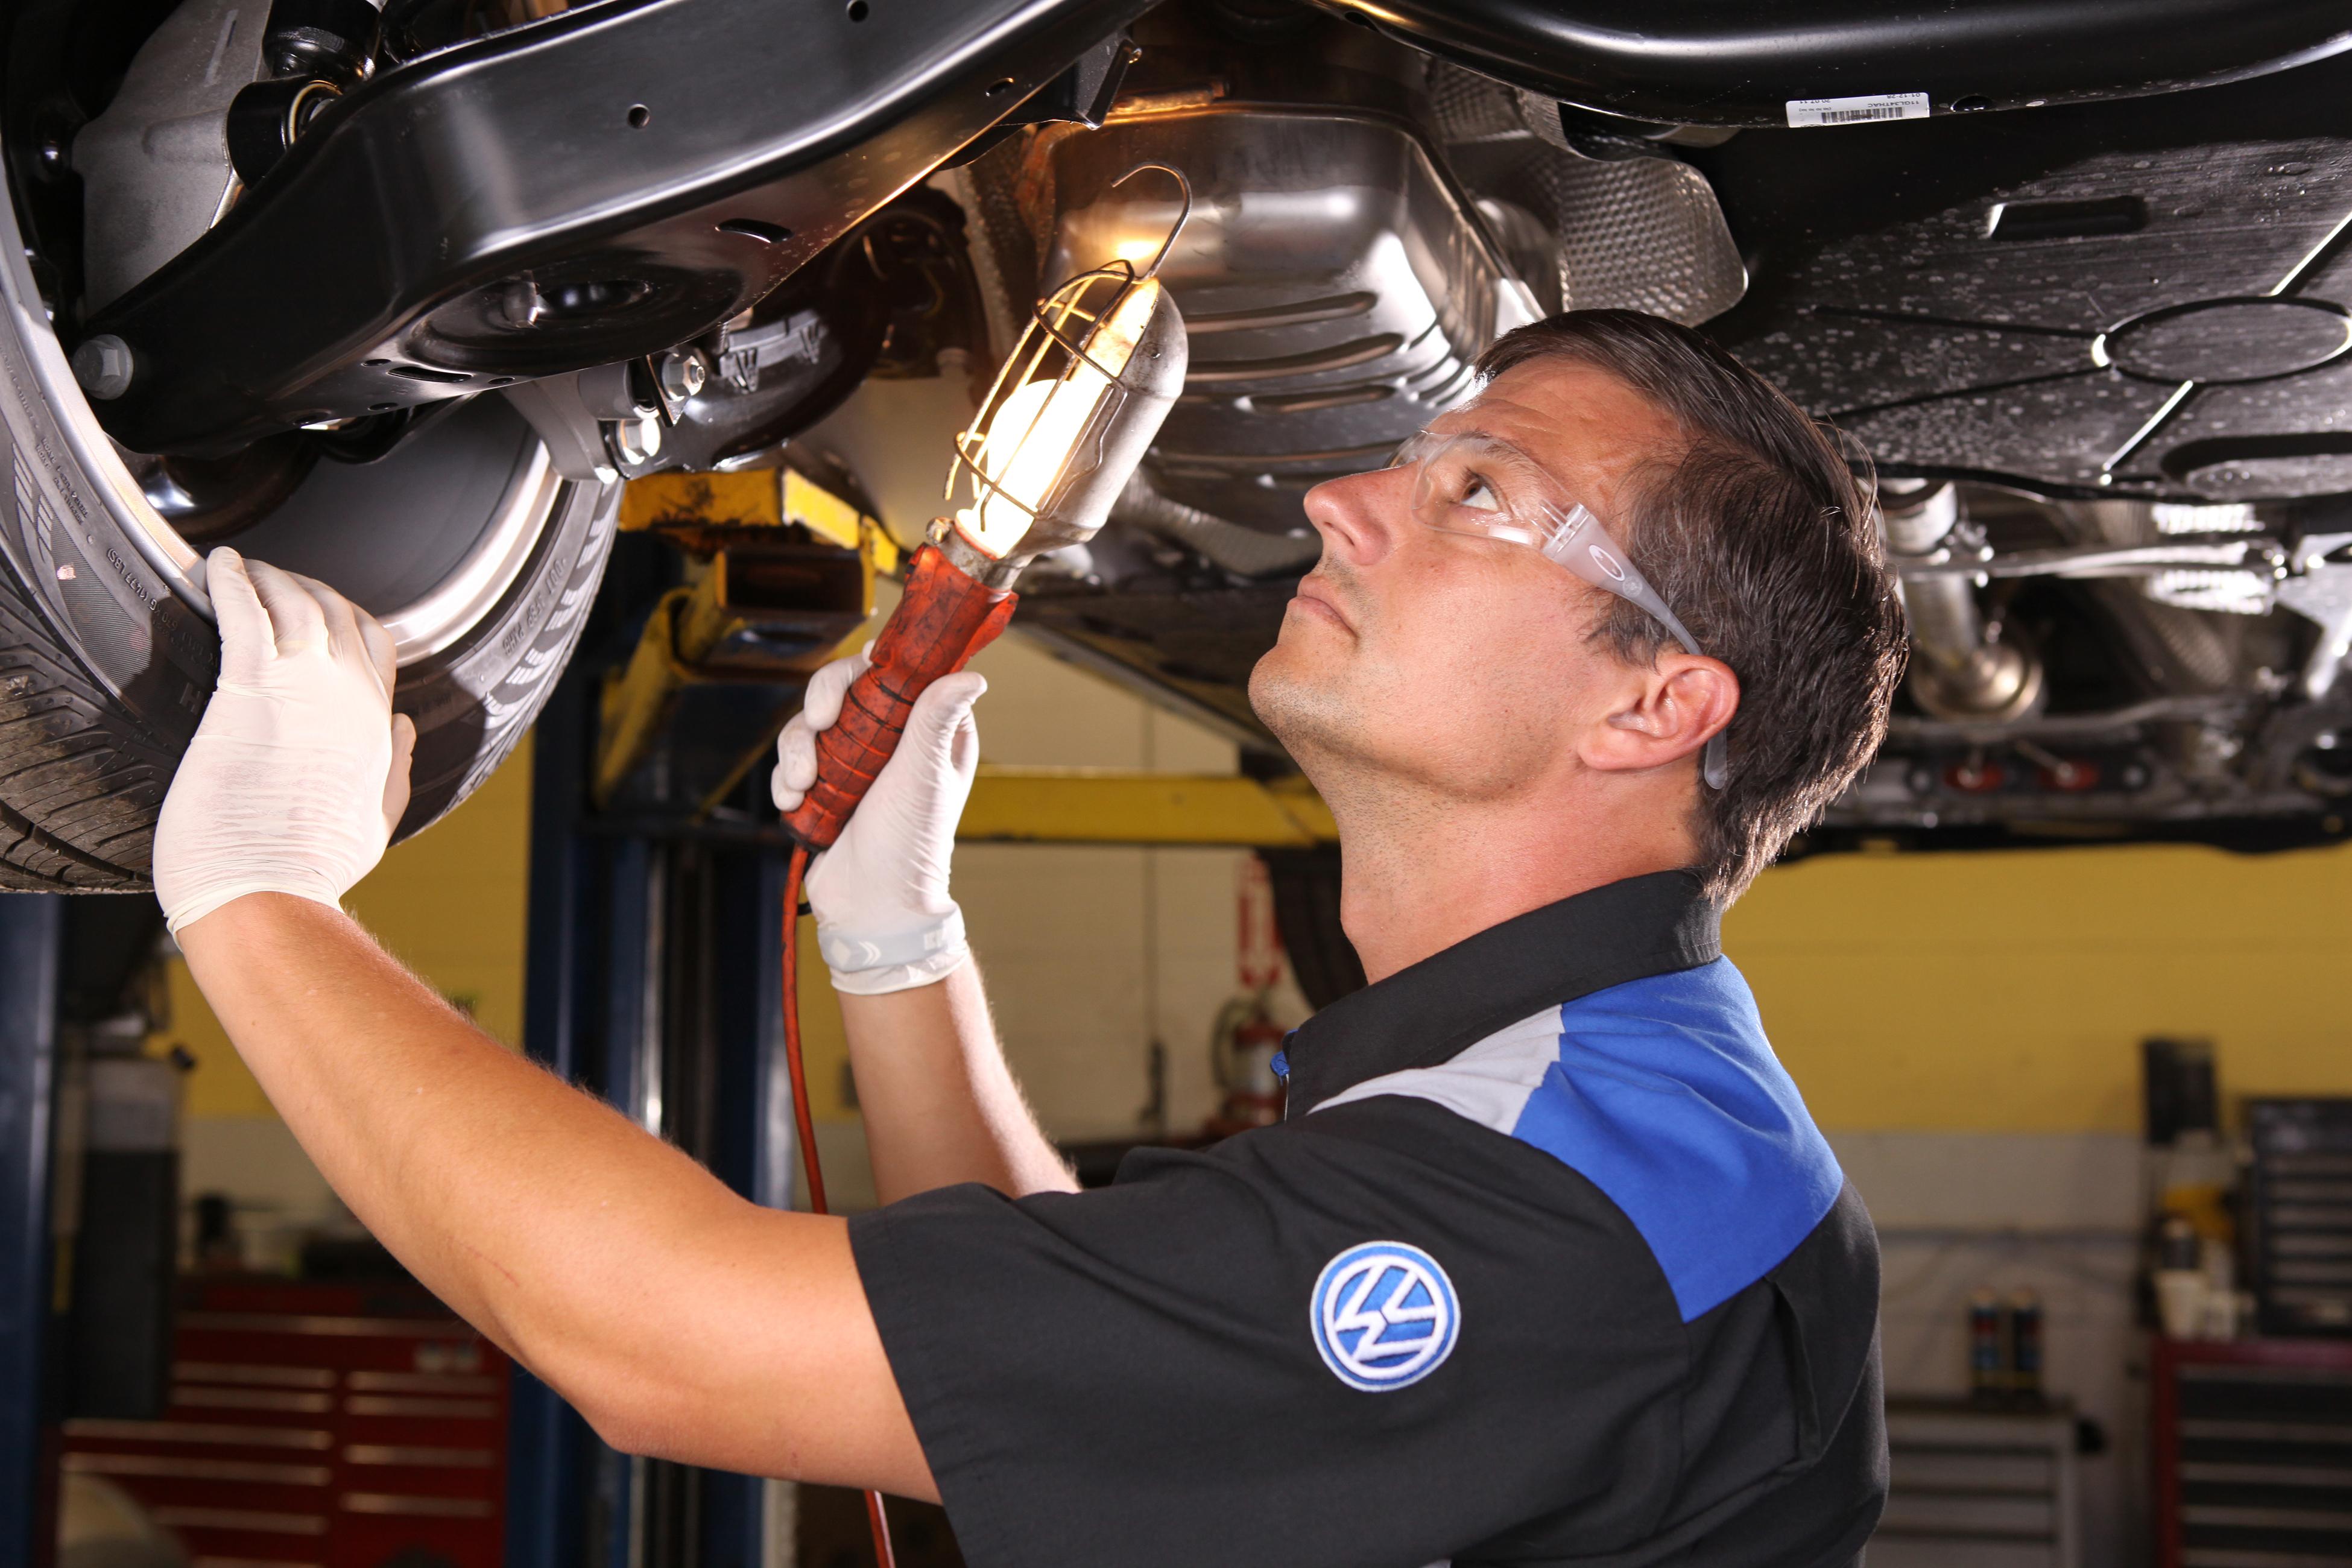 VW Service Technician